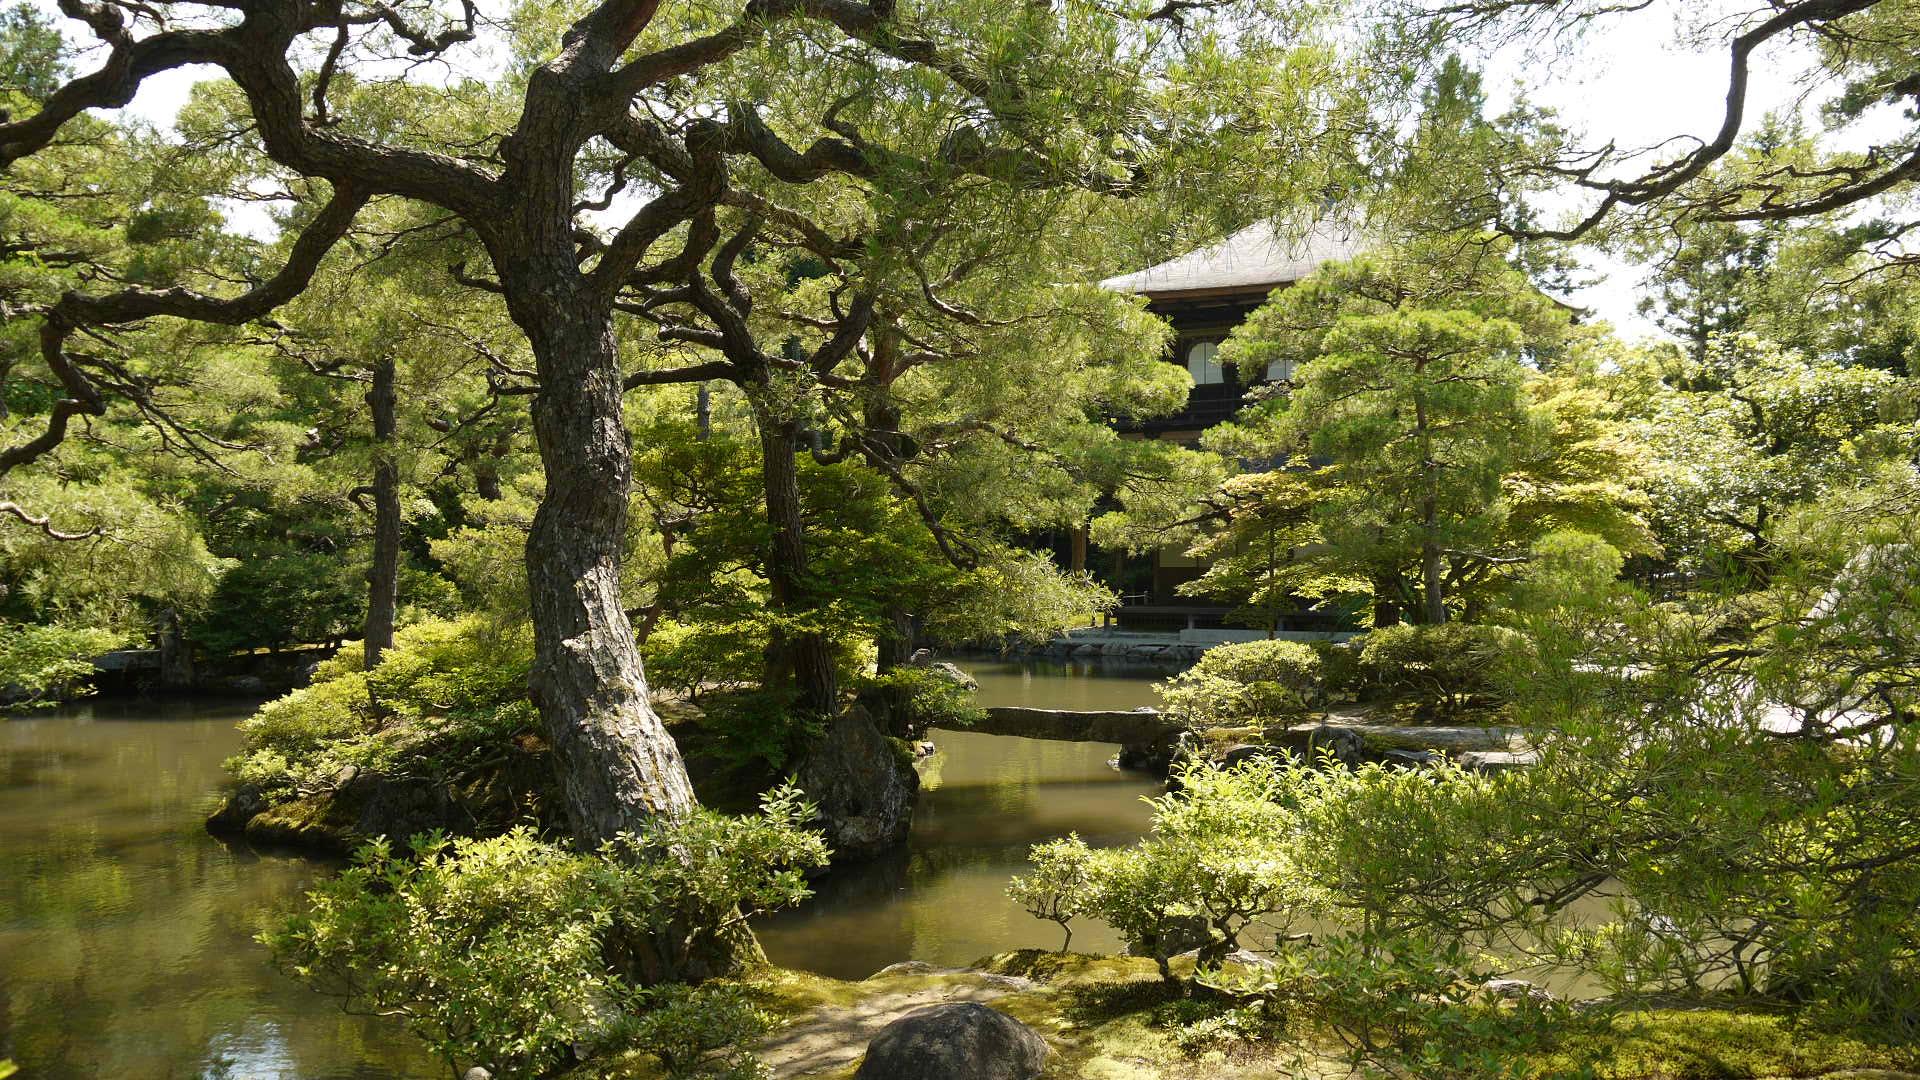 Ginkaku-ji_Temple_慈照寺(銀閣寺)3_-_panoramio.jpg